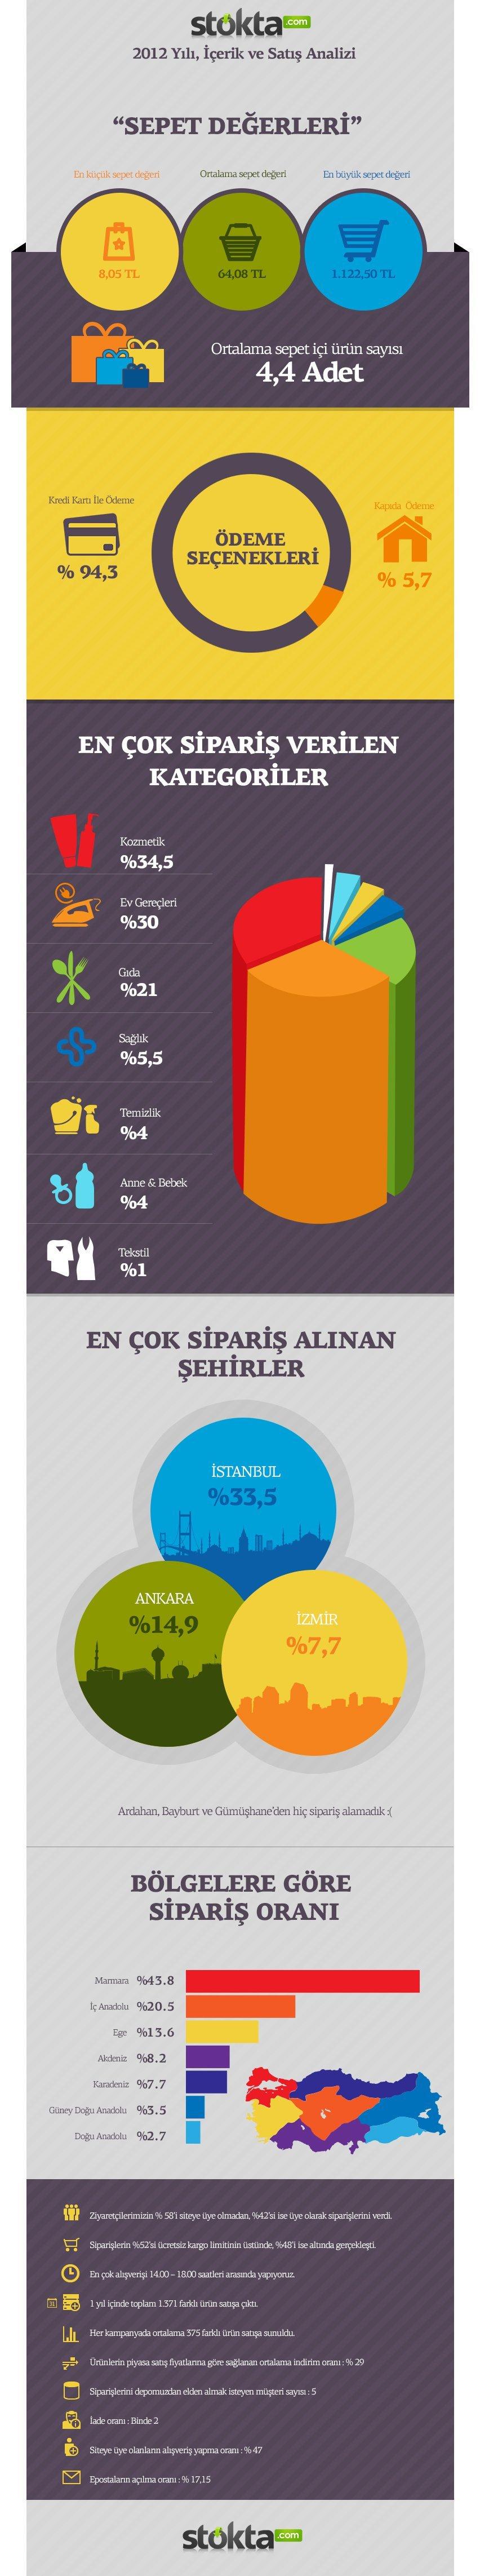 stokta-2012-infografik-logo